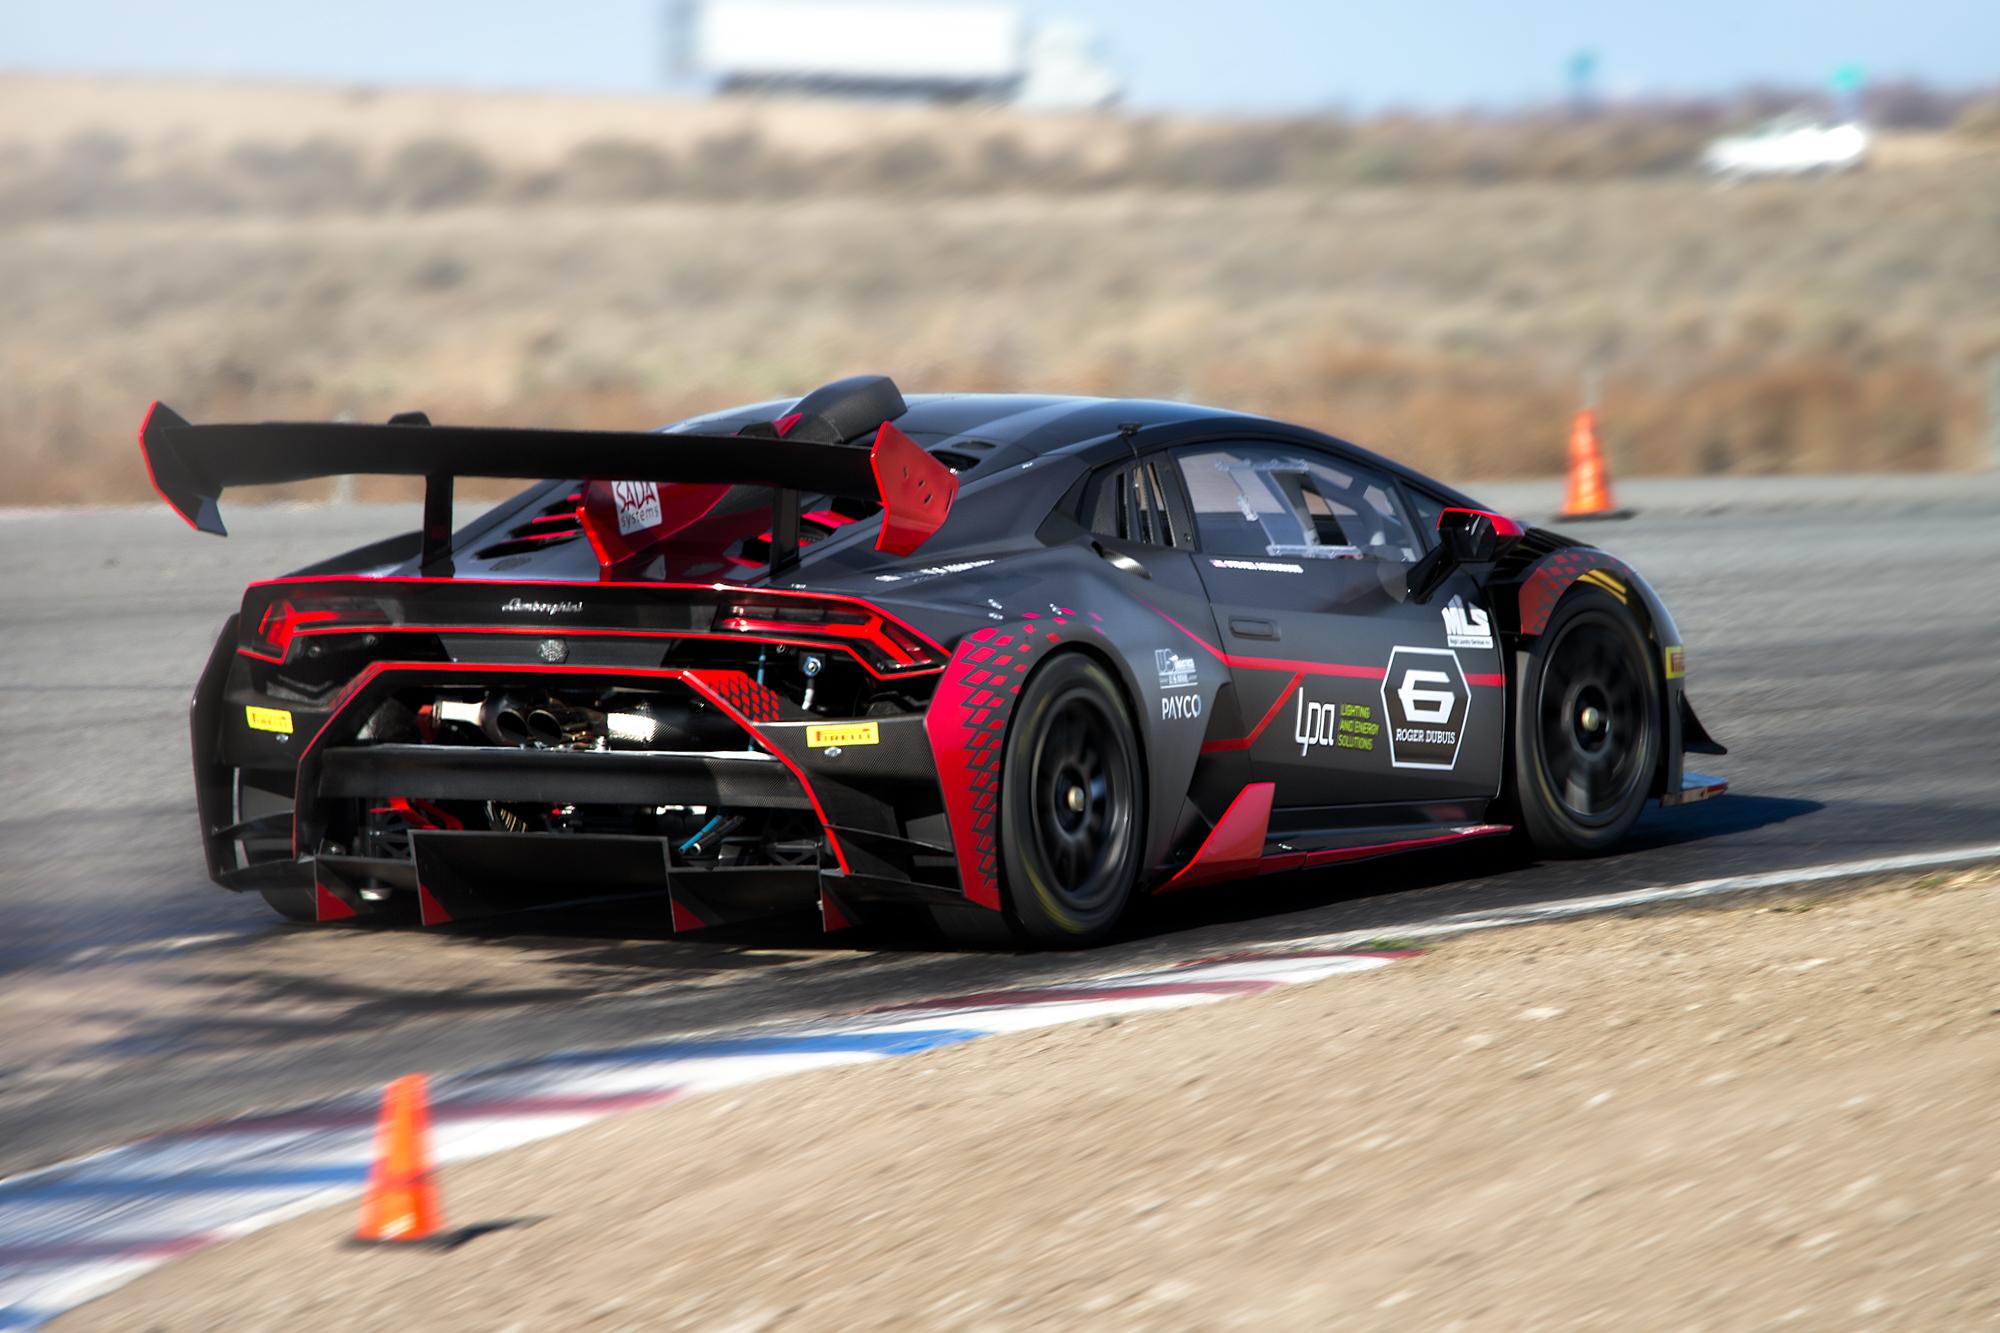 Steven-Racing-20180221-73695.jpg